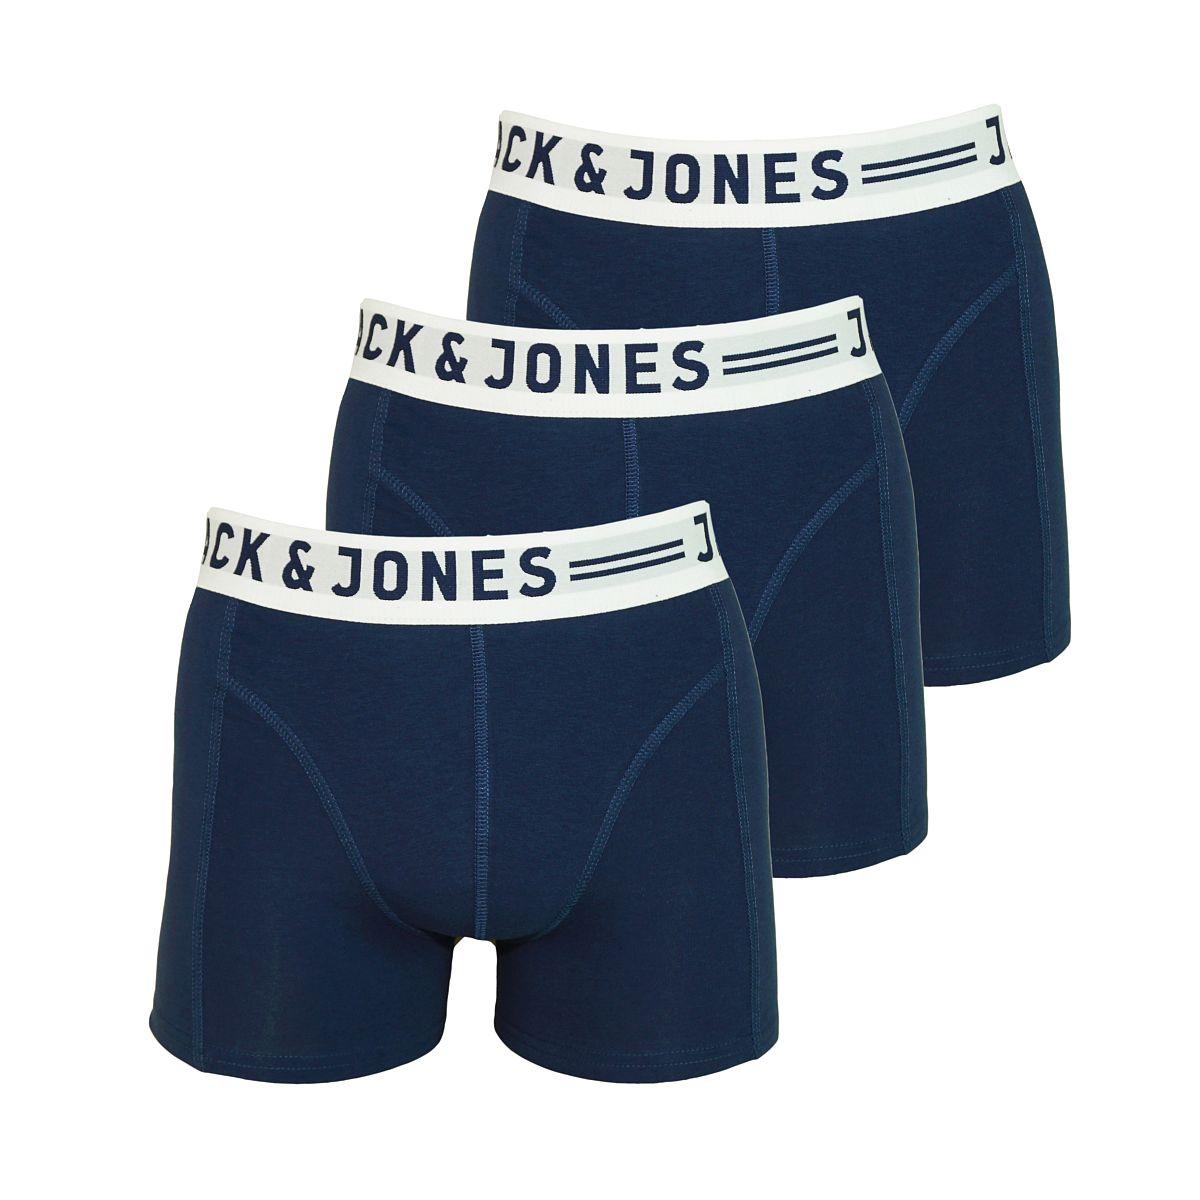 Jack & Jones 3er Pack Boxershorts Shorts Sense Trunks Noose JJ16 navy